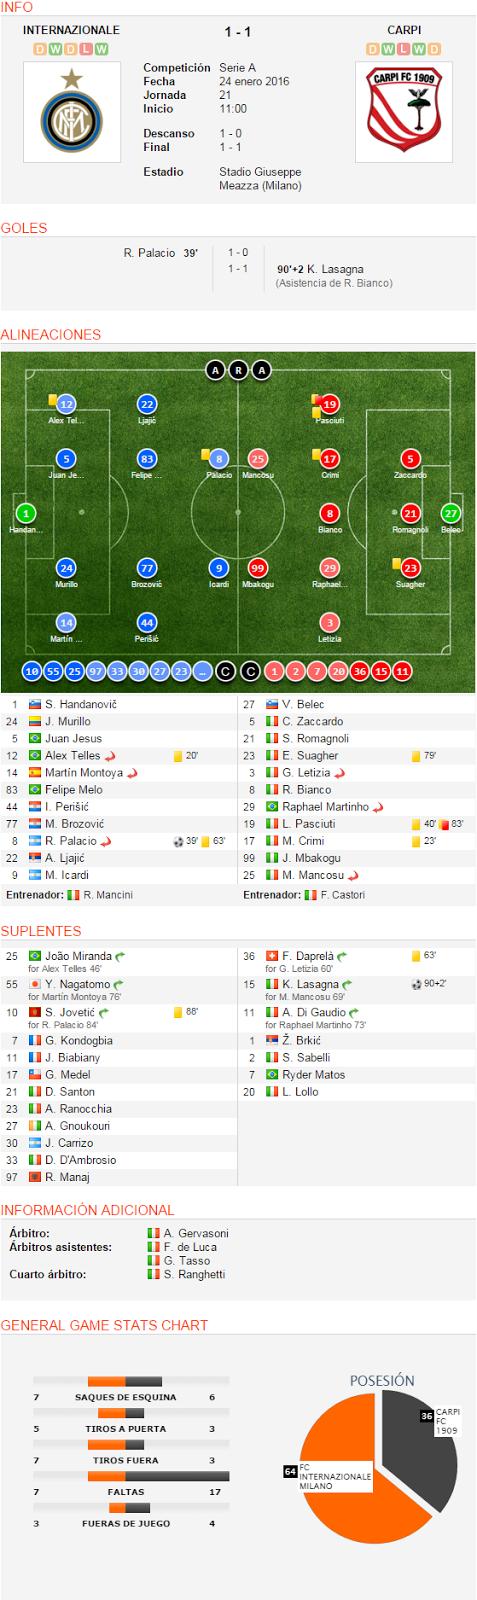 INFO INTERNAZIONALE DWDLW 1 - 1 CARPI DWLWD FC Internazionale Milano CompeticiónSerie AFecha24 enero 2016Jornada21Inicio 11:00 Descanso1 - 0Final1 - 1 EstadioStadio Giuseppe Meazza (Milano) Carpi FC 1909 GOLES R. Palacio 39' 1 - 0 1 - 1 90'+2 K. Lasagna (Asistencia de R. Bianco) ALINEACIONES 1 S. Handanovič 24 J. Murillo 5 Juan Jesus 12 Alex Telles Sustituido 20' 14 Martín Montoya Sustituido 83 Felipe Melo 44 I. Perišić 77 M. Brozović 8 R. Palacio Sustituido 39' 63' 22 A. Ljajić 9 M. Icardi Entrenador: R. Mancini 27 V. Belec 5 C. Zaccardo 21 S. Romagnoli 23 E. Suagher 79' 3 G. Letizia Sustituido 8 R. Bianco 29 Raphael Martinho Sustituido 19 L. Pasciuti 40' 83' 17 M. Crimi 23' 99 J. Mbakogu 25 M. Mancosu Sustituido Entrenador: F. Castori SUPLENTES 25 João Miranda Sustituido for Alex Telles 46' 55 Y. Nagatomo Sustituido for Martín Montoya 76' 10 S. Jovetić Sustituido for R. Palacio 84' 88' 7 G. Kondogbia 11 J. Biabiany 17 G. Medel 21 D. Santon 23 A. Ranocchia 27 A. Gnoukouri 30 J. Carrizo 33 D. D'Ambrosio 97 R. Manaj 36 F. Daprelà Sustituido for G. Letizia 60' 63' 15 K. Lasagna Sustituido for M. Mancosu 69' 90+2' 11 A. Di Gaudio Sustituido for Raphael Martinho 73' 1 Ž. Brkić 2 S. Sabelli 7 Ryder Matos 20 L. Lollo INFORMACIÓN ADICIONAL Árbitro:A. GervasoniÁrbitros asistentes:F. de Luca G. Tasso Cuarto árbitro:S. Ranghetti GENERAL GAME STATS CHART